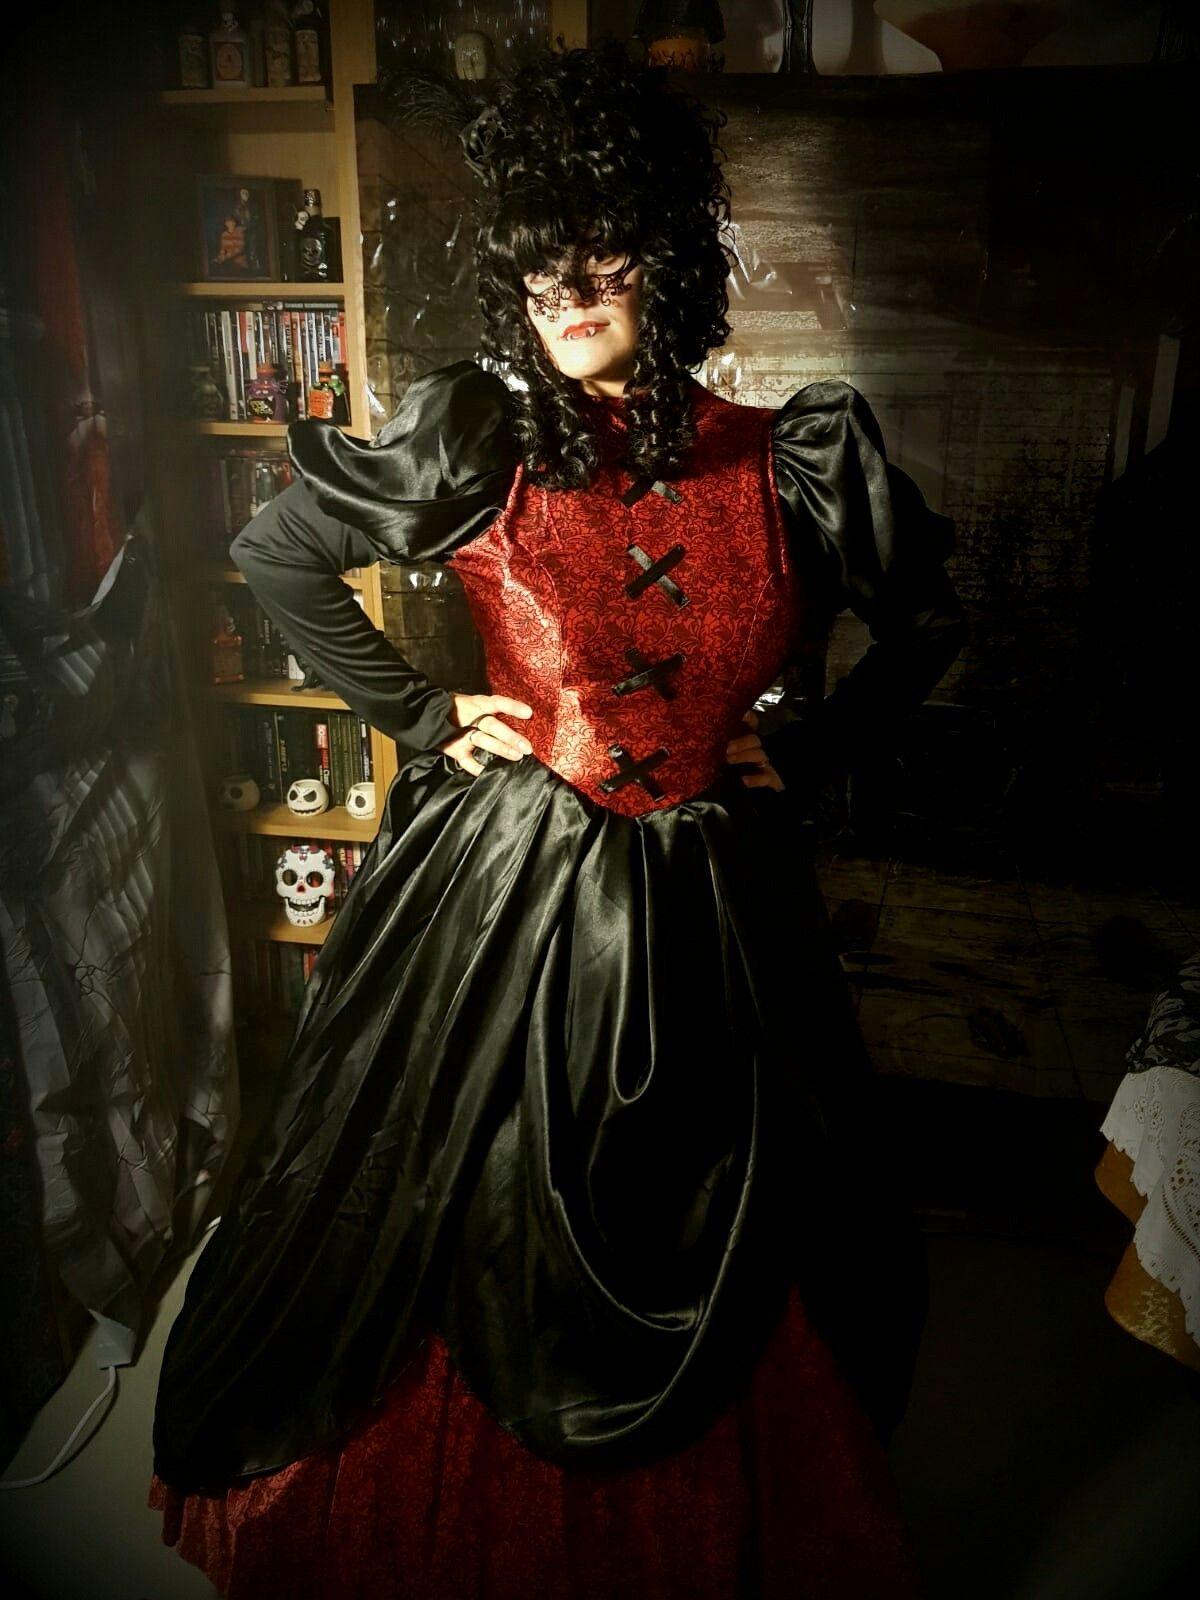 Gothic Masquerade Vampire Queen Ball Fancy Dress Halloween